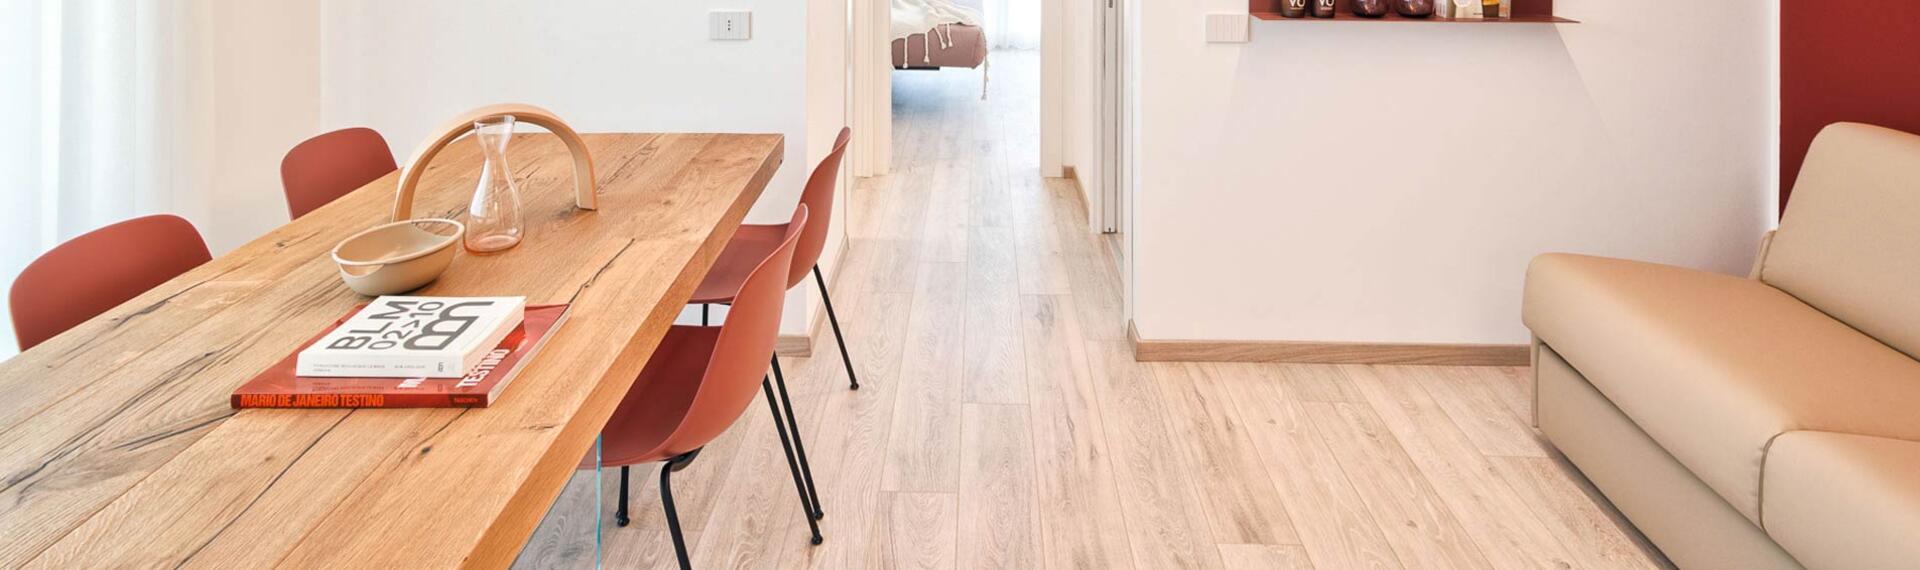 residencealbamarina en two-room-apartment 001